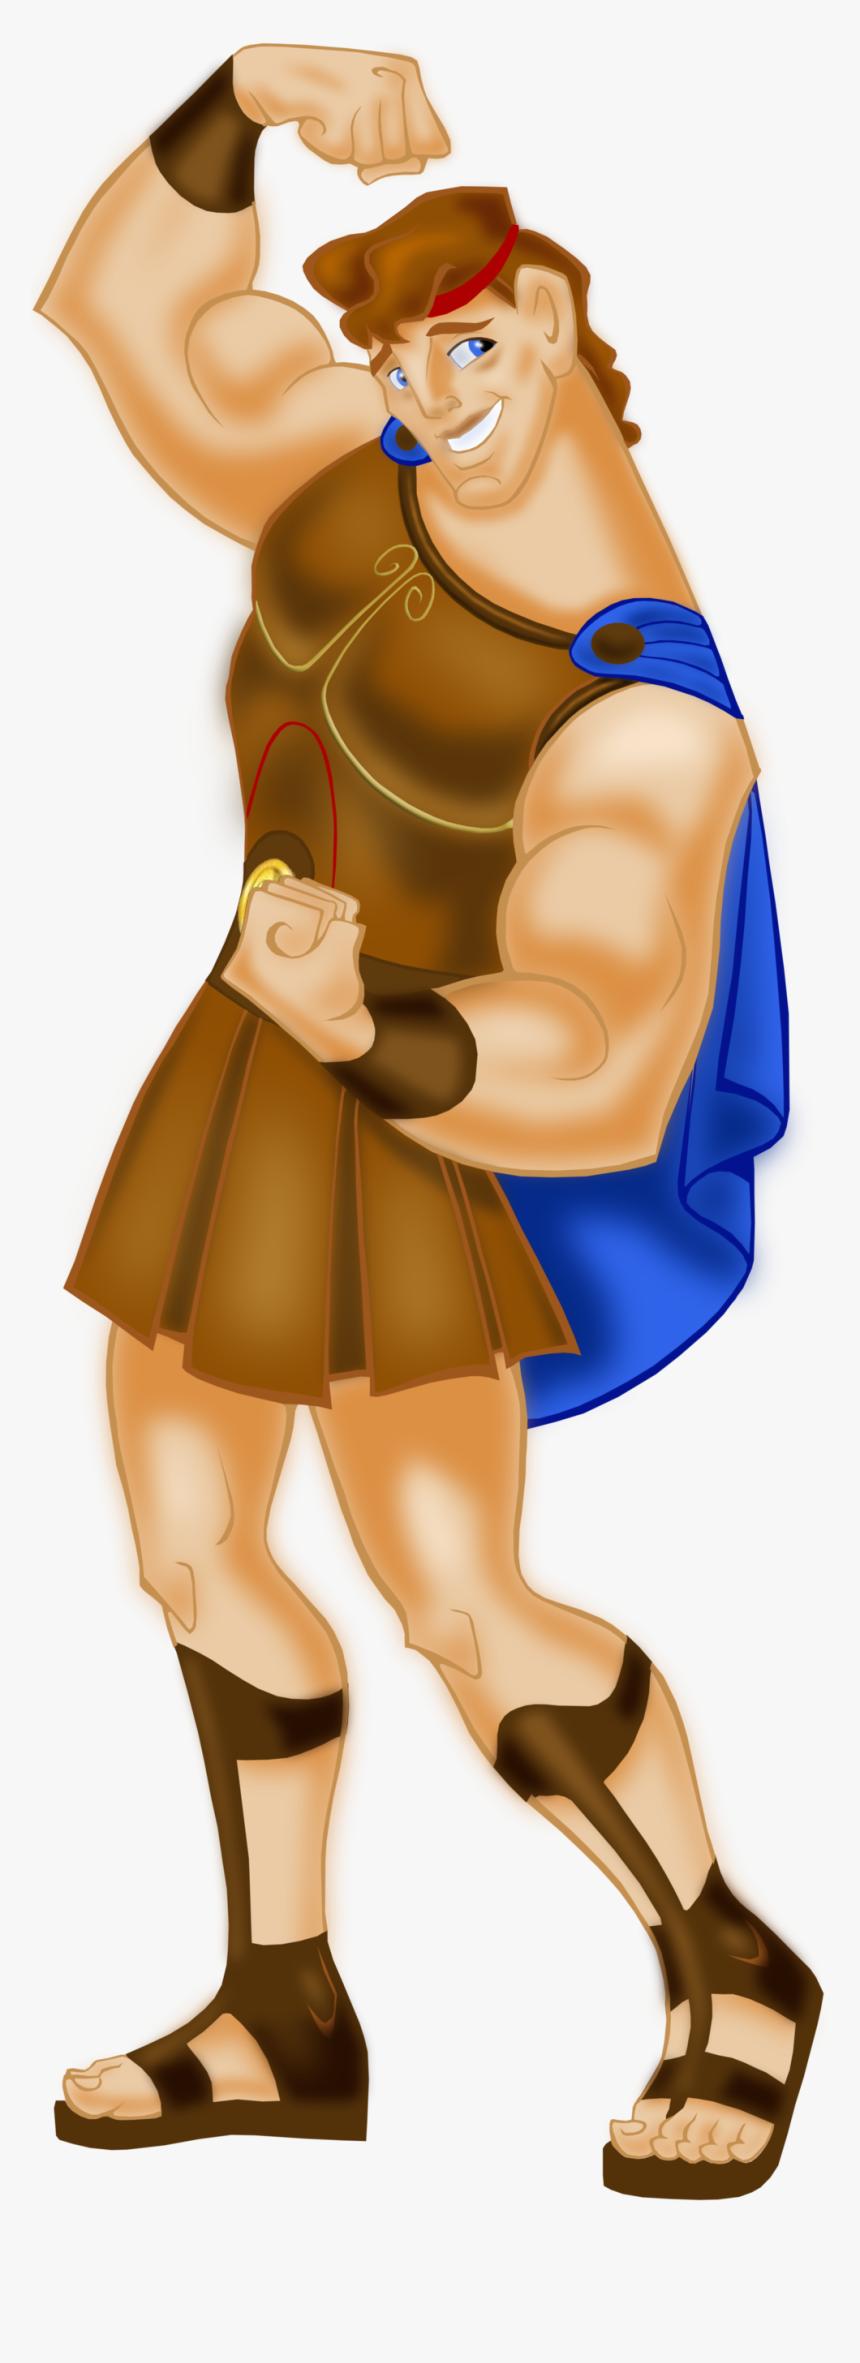 Hercules Clipart At Free For Personal Use Hercules Teseu Desenho